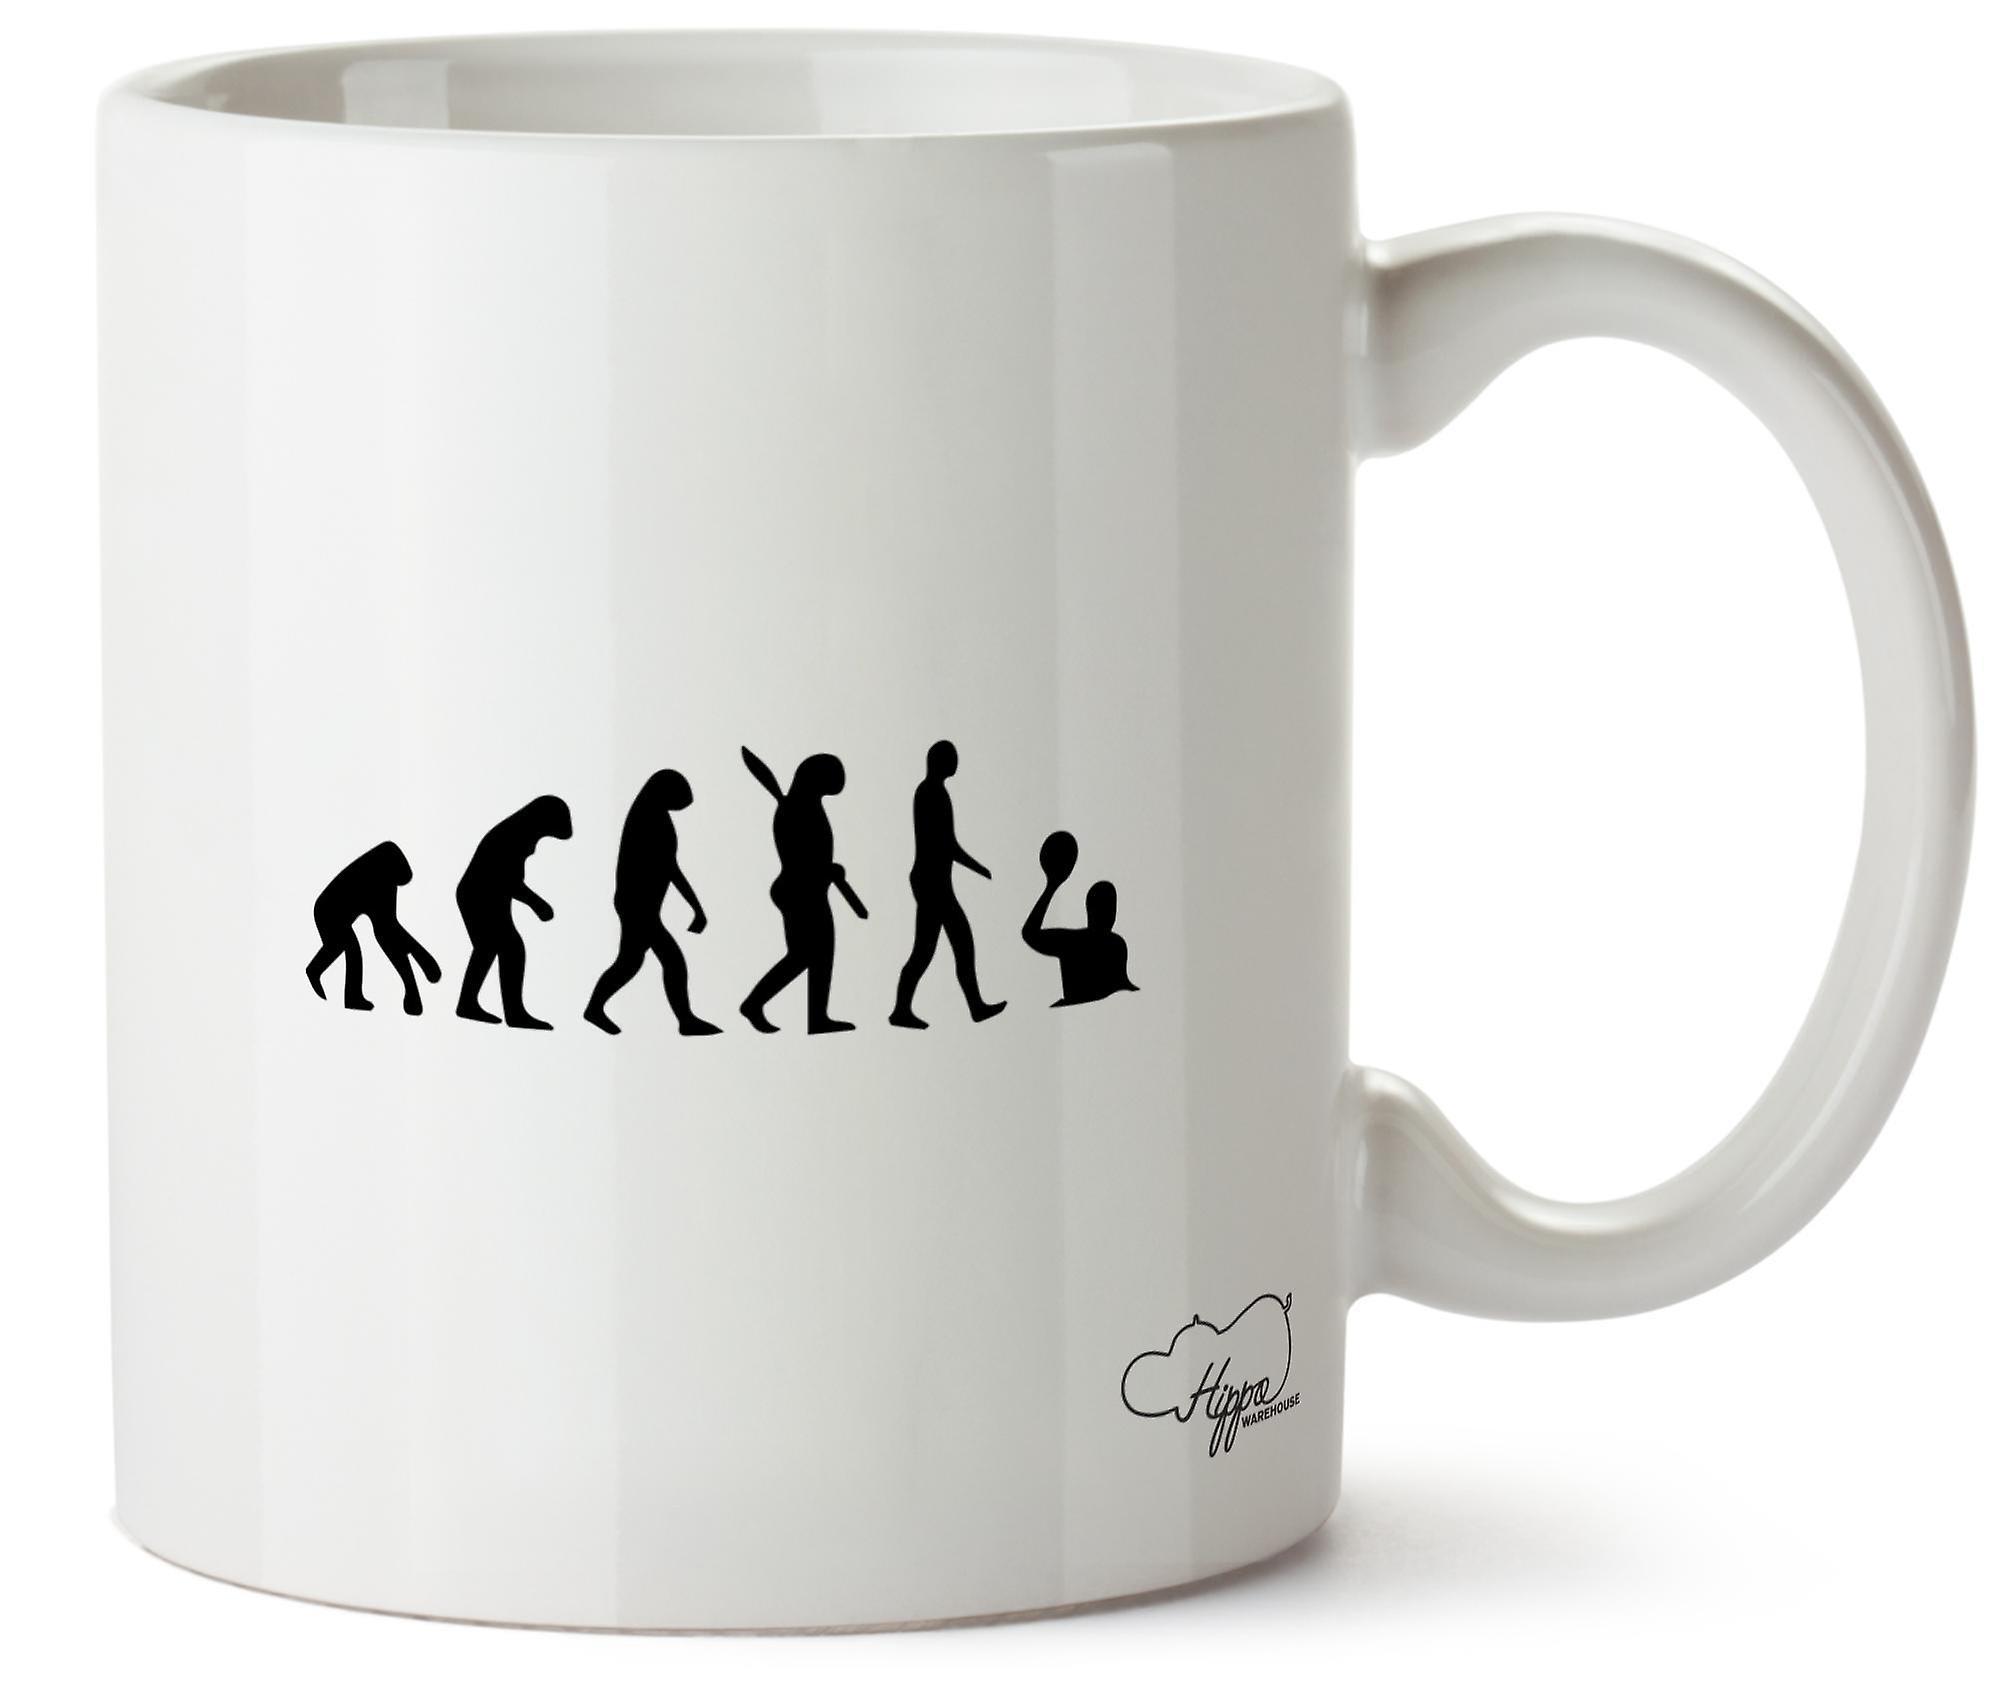 Hippowarehouse Evolution Of Water Polo Players Printed Mug Cup Ceramic 10oz